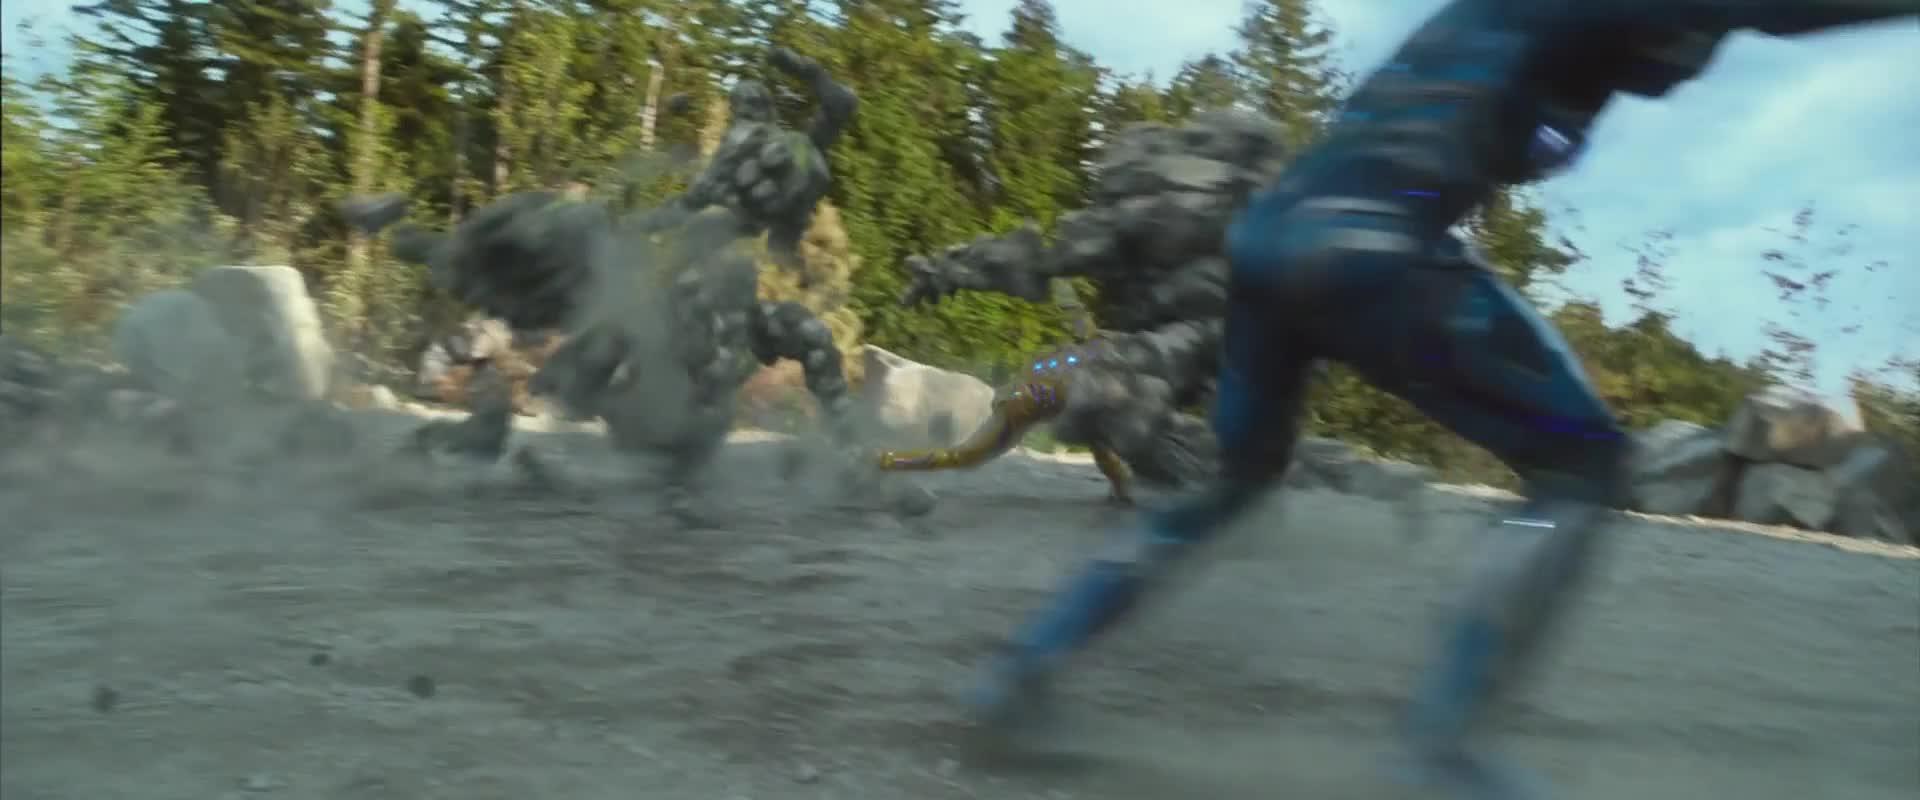 power rangers, Power Rangers GIFs